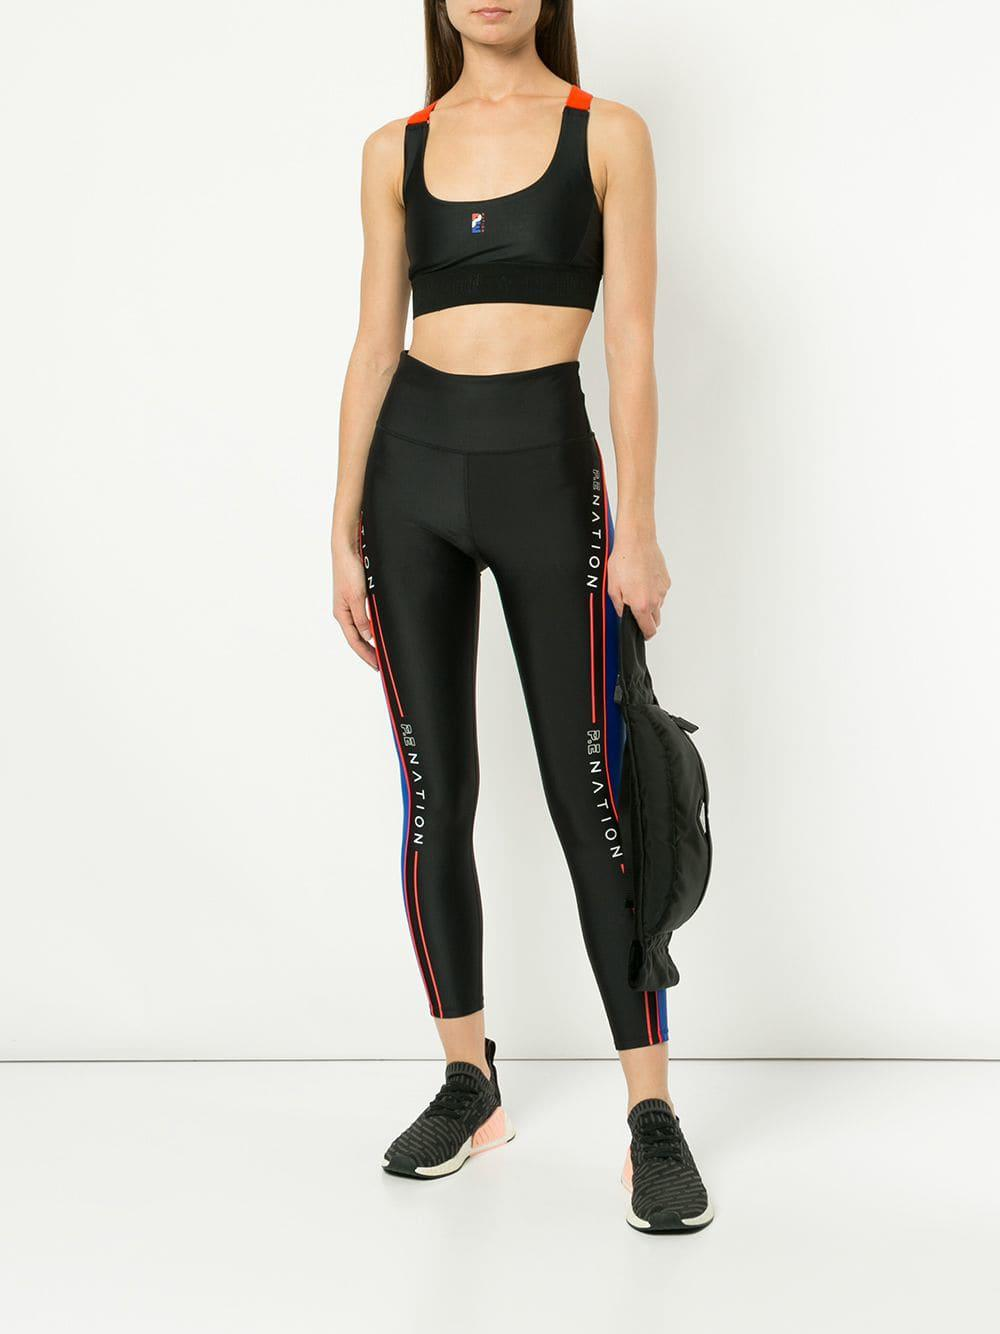 new styles 6f1d5 f0937 pe-nation-designer-black-Three-Point-leggings.jpeg